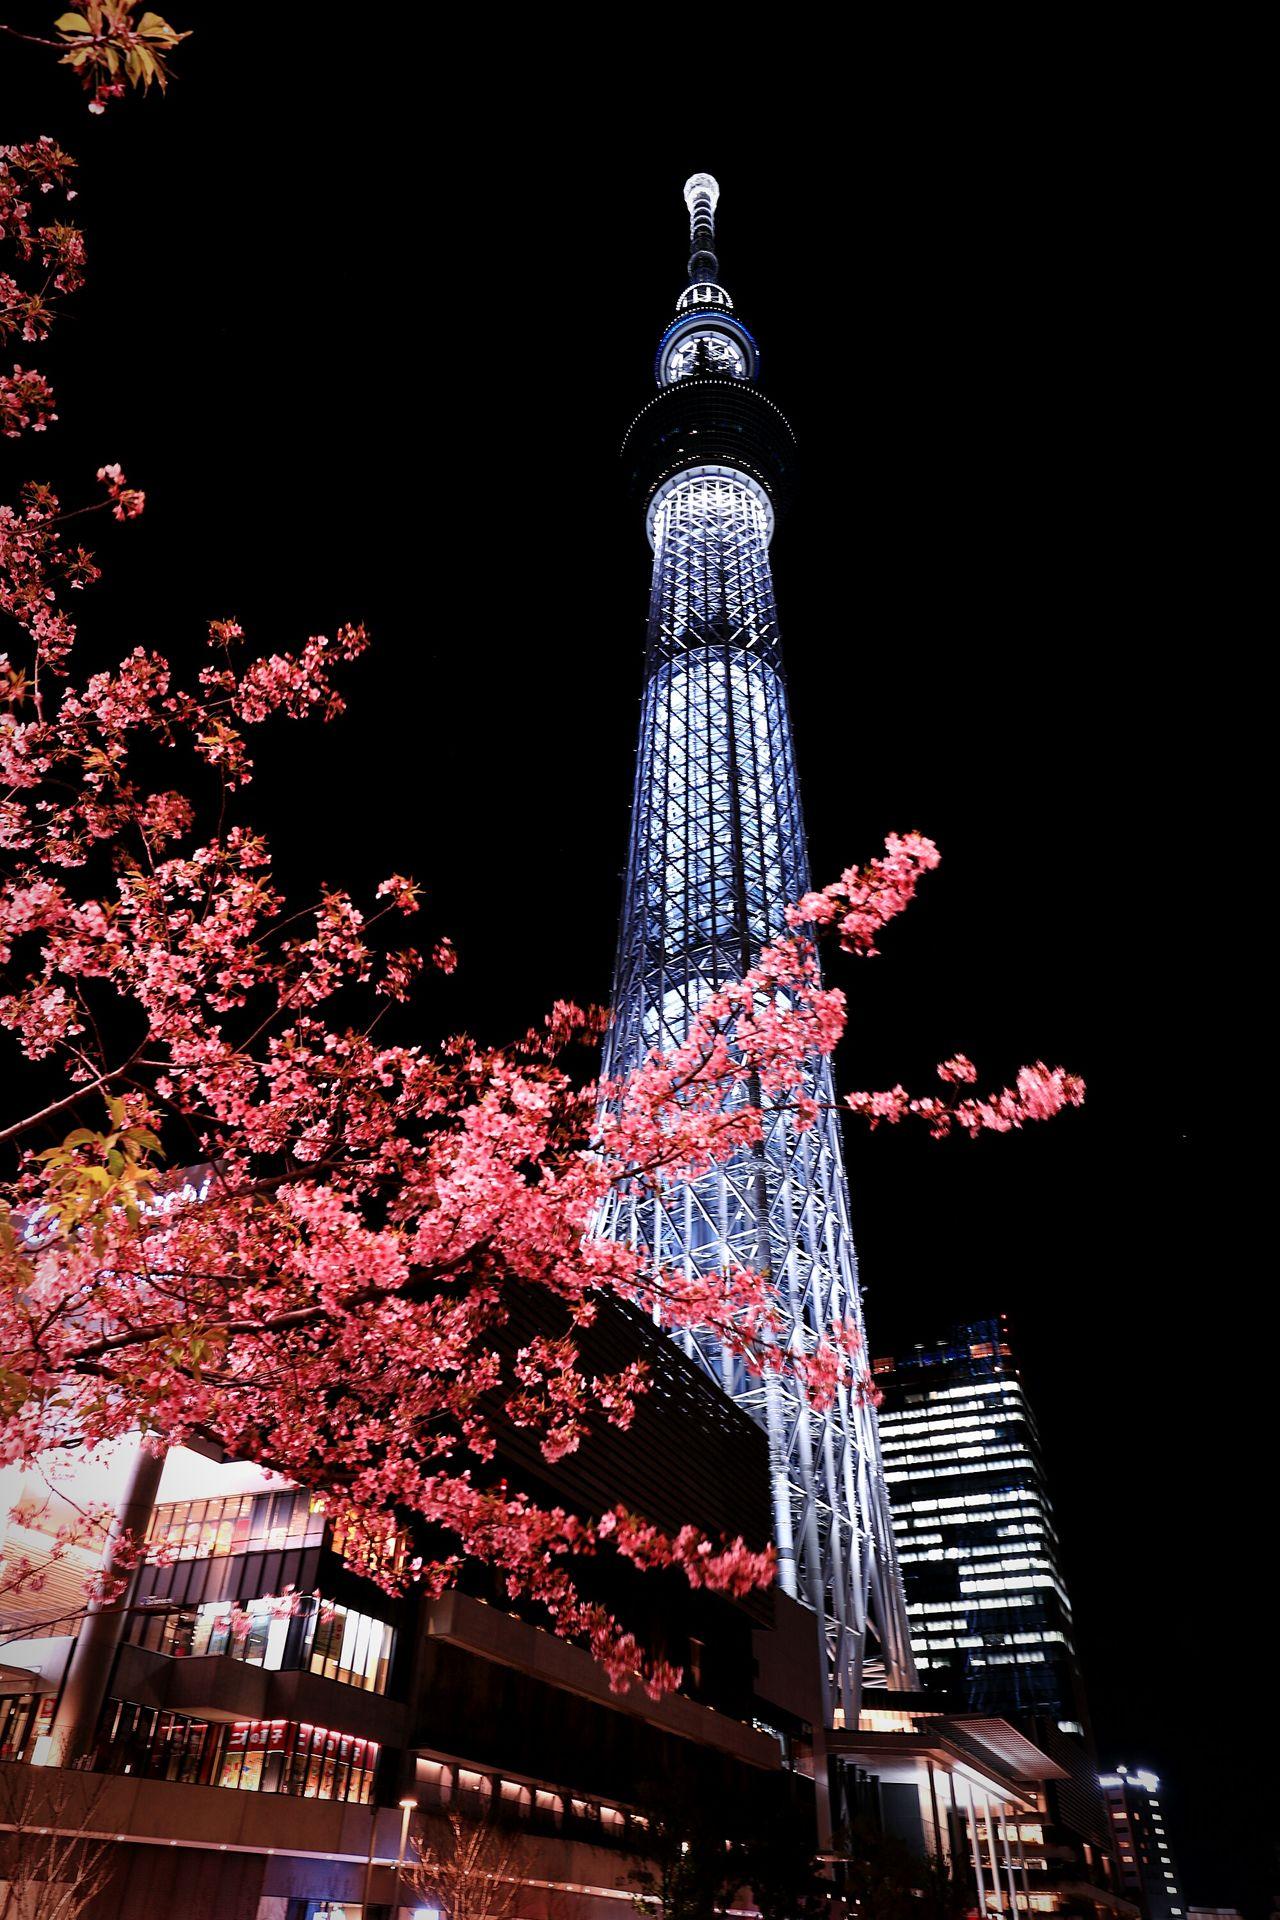 Tokyo Japan Skytree Tokyoskytree Illuminated Nightscape Nightphotography Nightview Flower Flowers Blossoms  Cherry Blossom